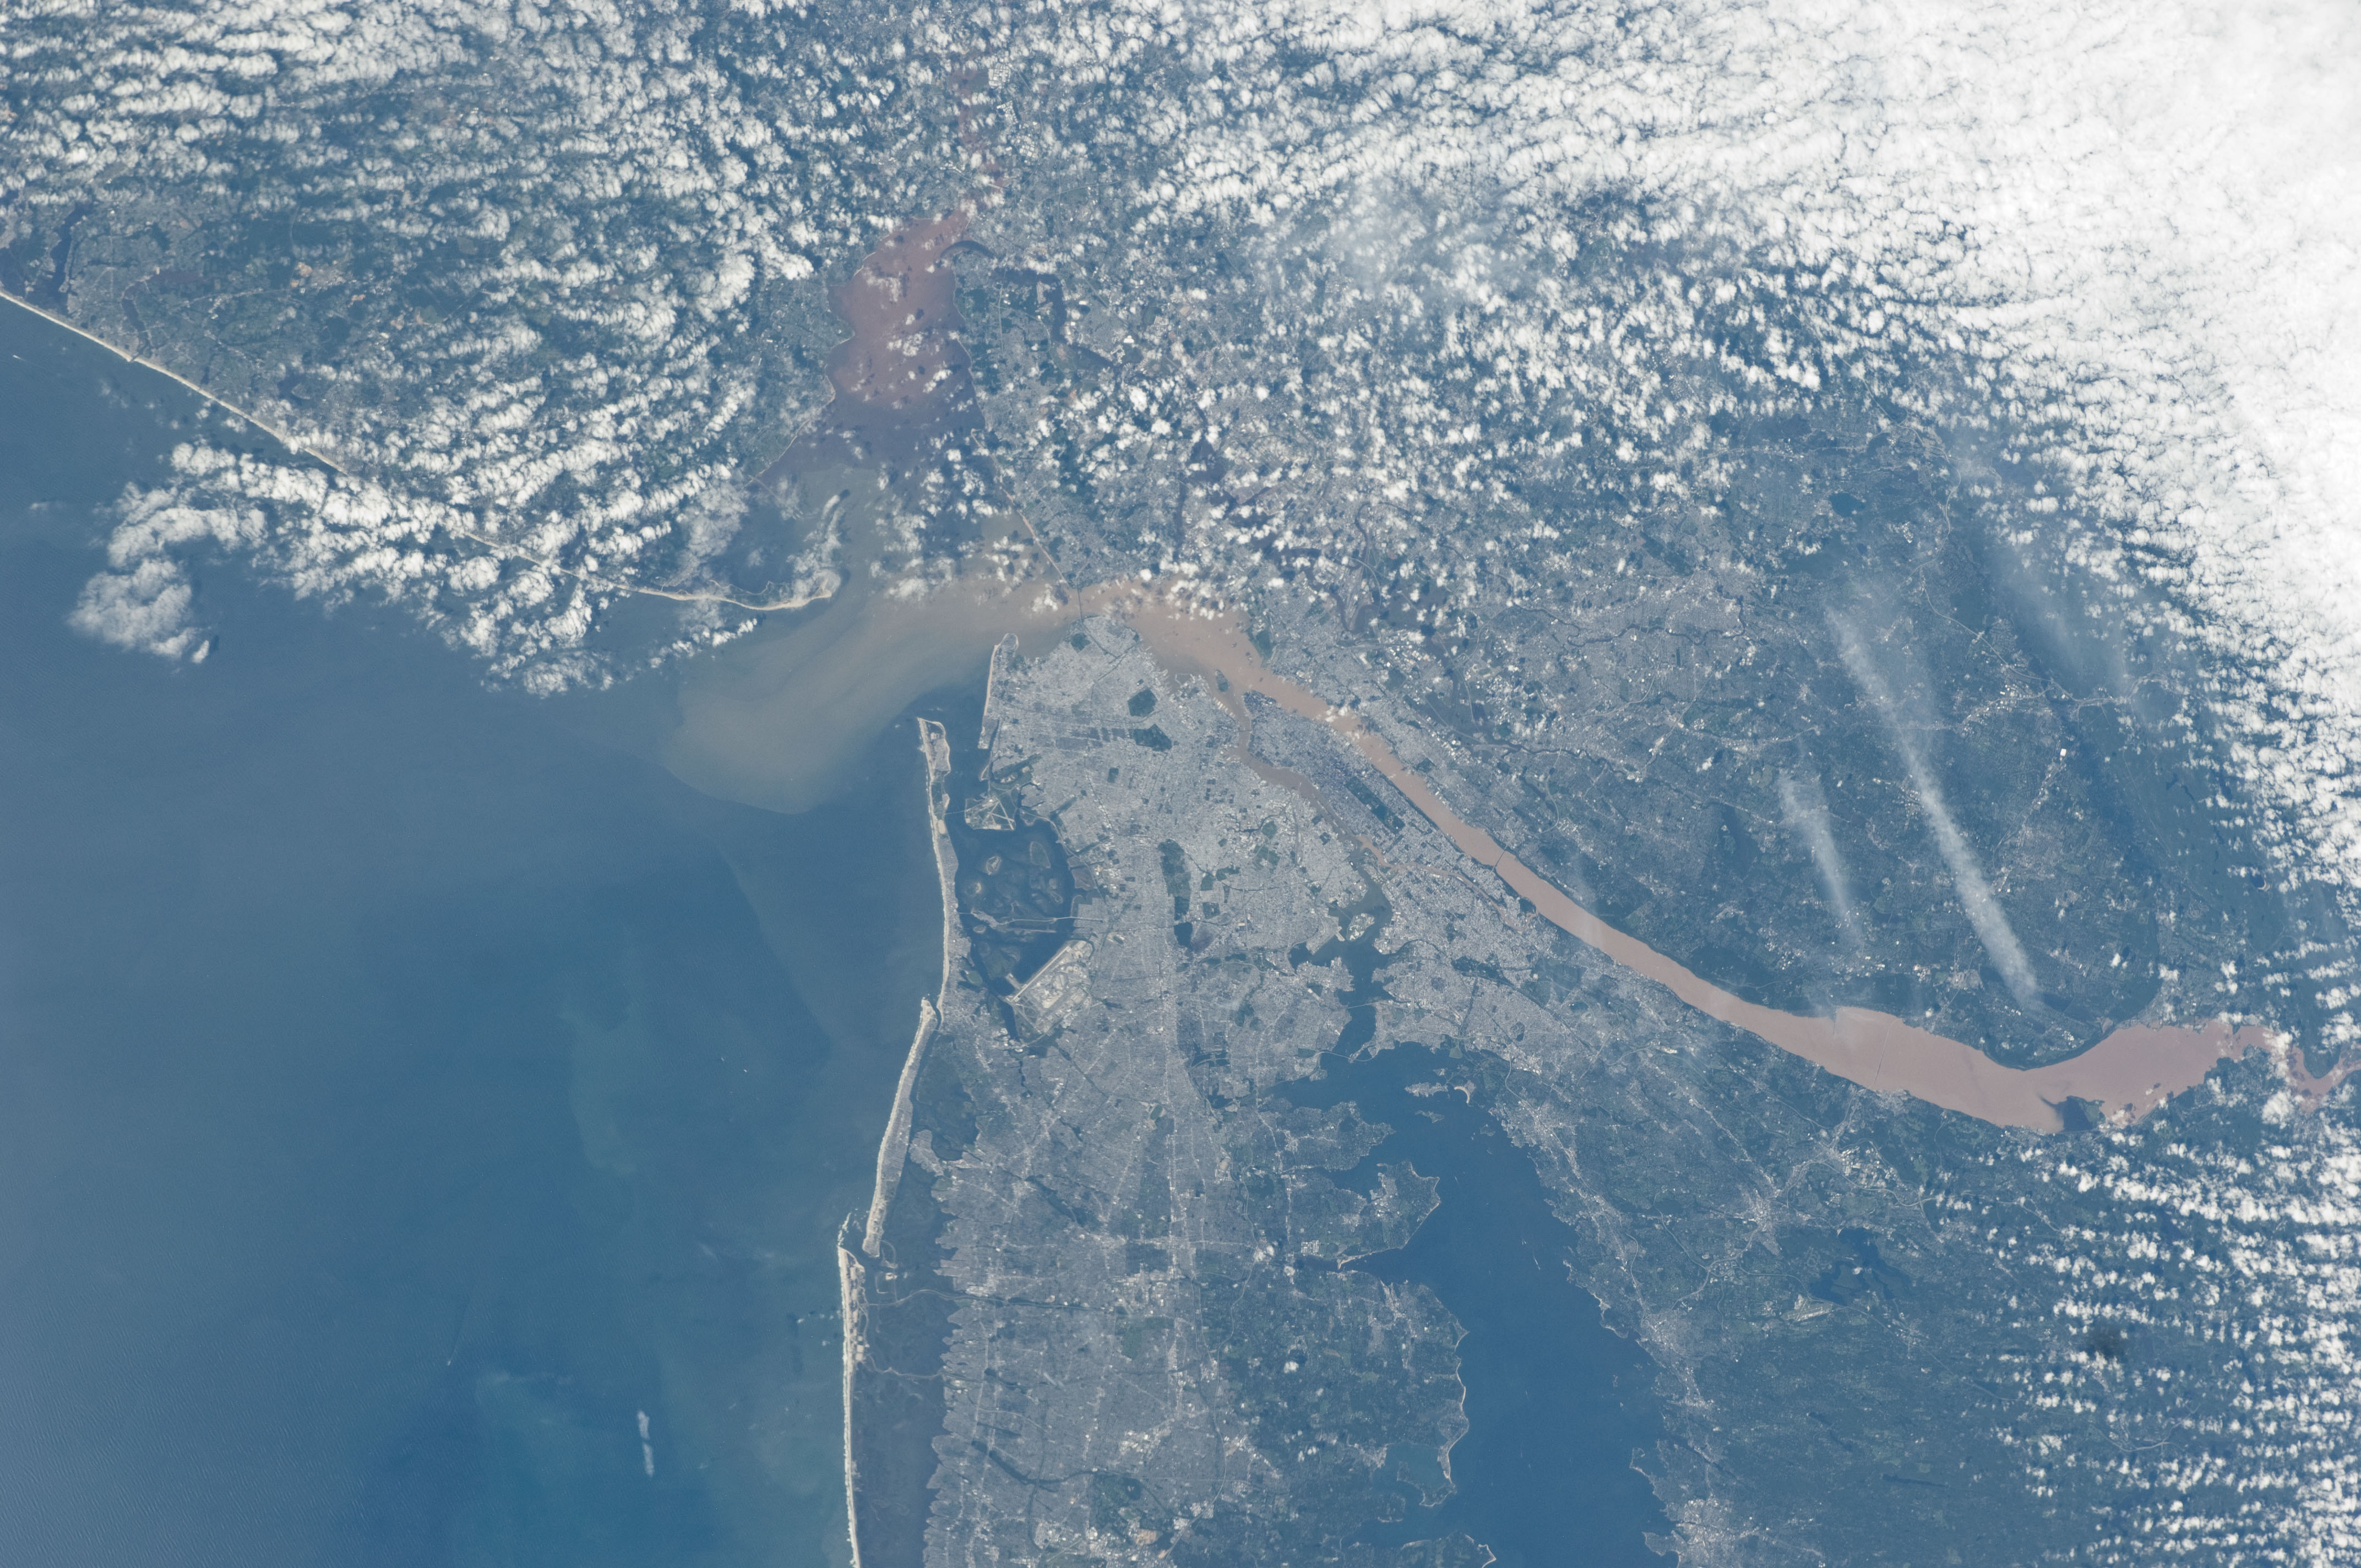 New York City (NASA, International Space Station, 09/09/11 ...